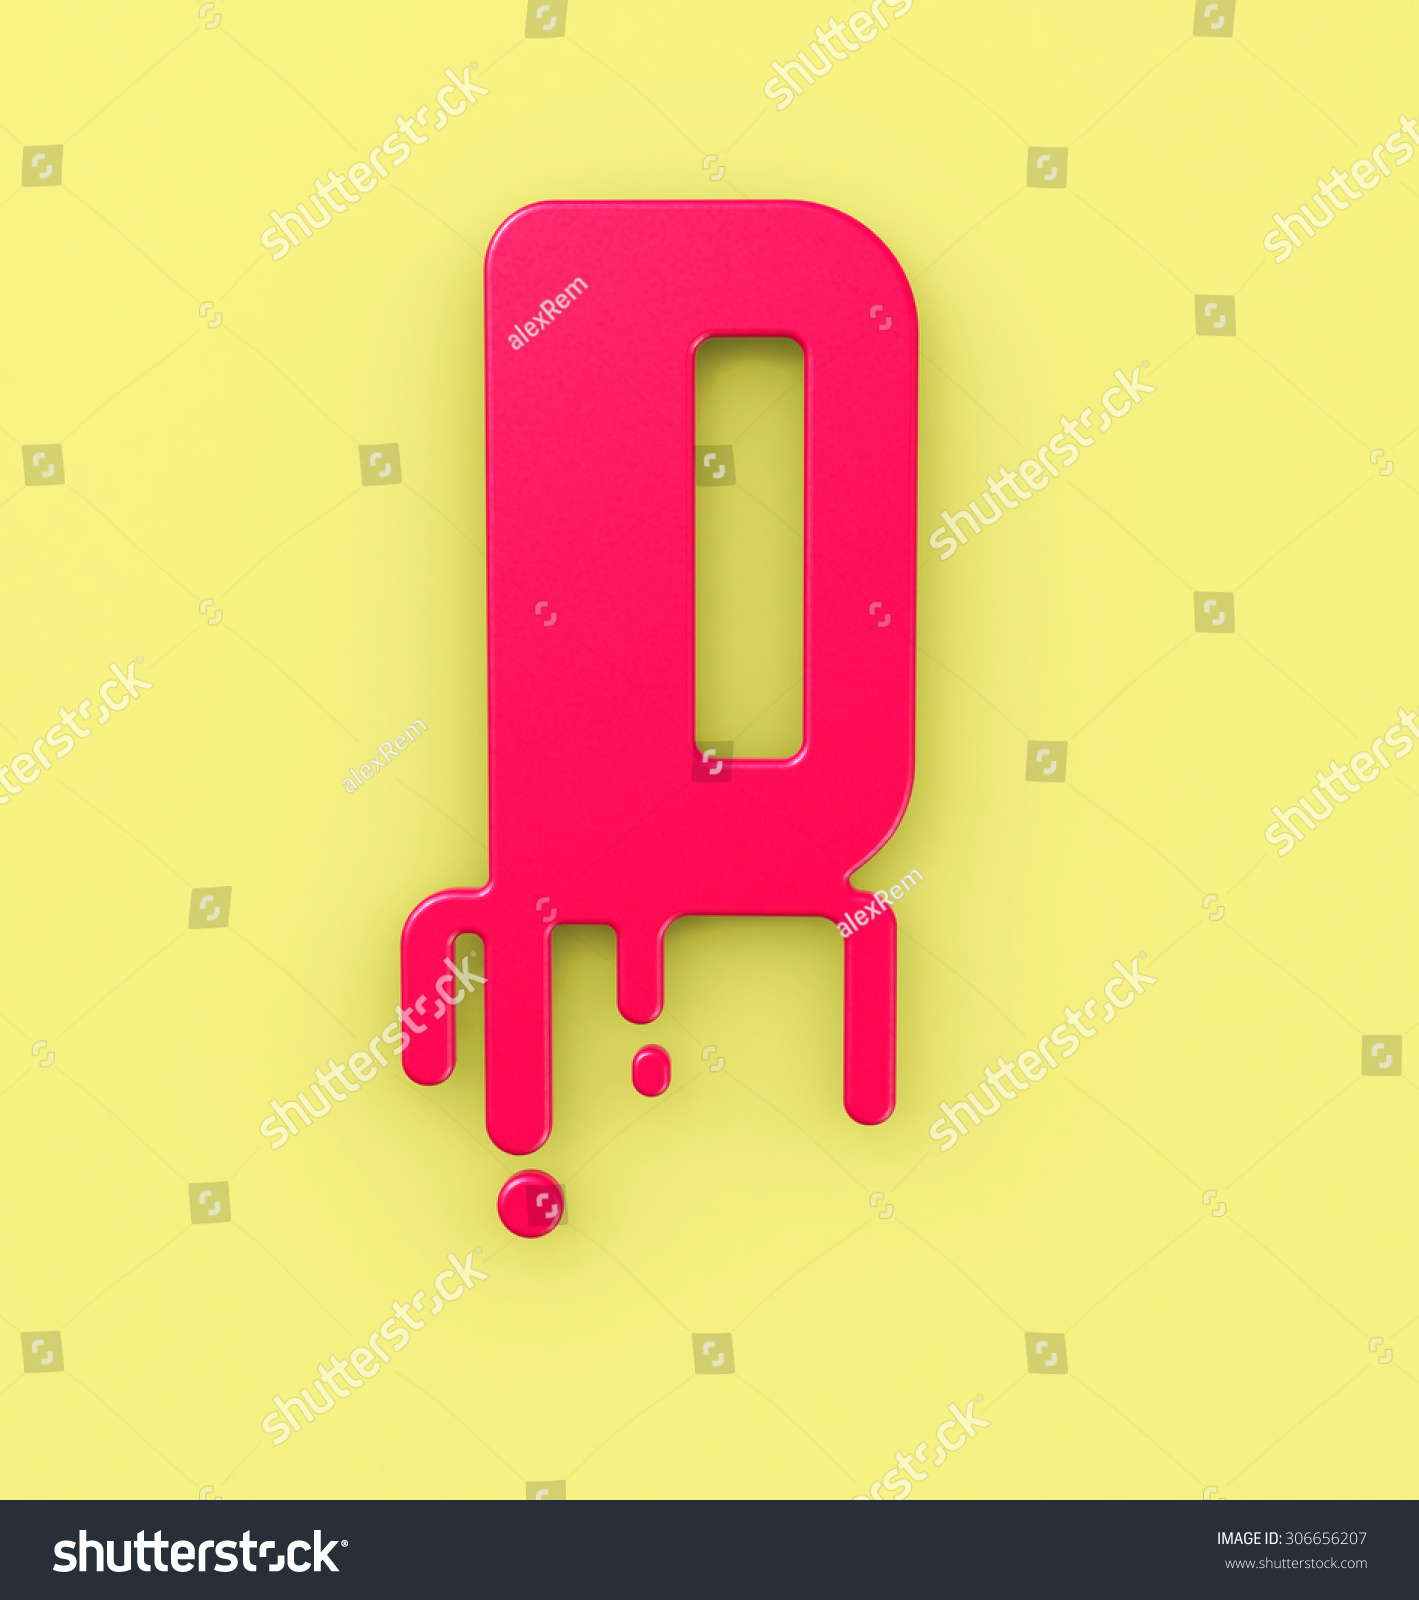 Abstract Melting Letter D Symbol 3 D Stock Illustration 306656207